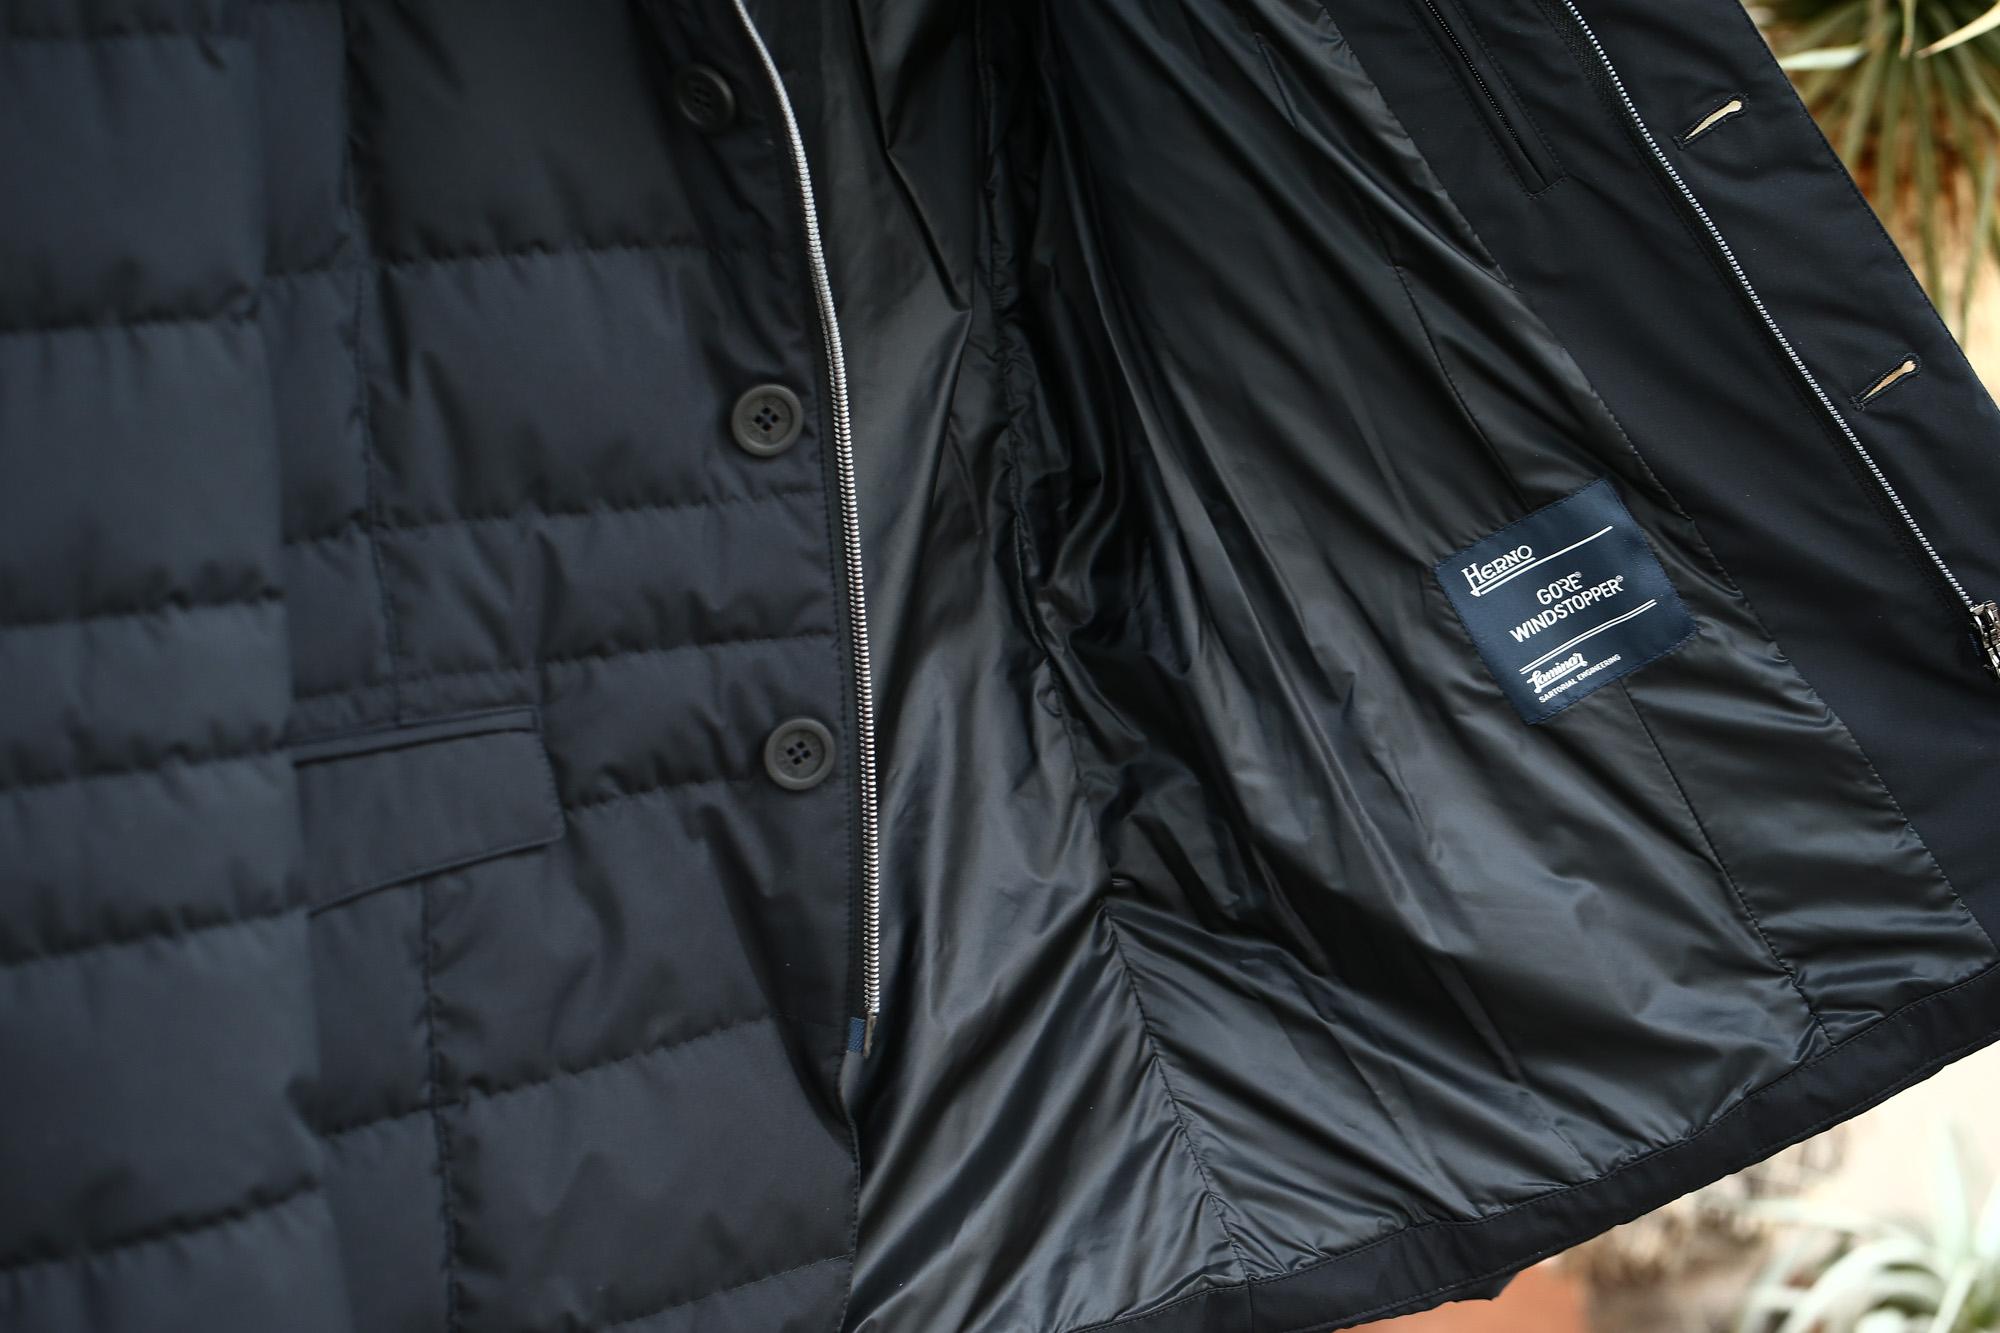 HERNO(ヘルノ) PI006UL LAMINAR Down Jacket ラミナー ダウンジャケット GORE-TEX ゴアテックス GORE WINDSTOPPER ゴアウィンドストッパー ダウンジャケット BLACK (ブラック・9300) Made in italy (イタリア製) 2017 秋冬新作 愛知 名古屋 herno ヘルノ ラミナージャケット 42,44,46,48,50,52,54